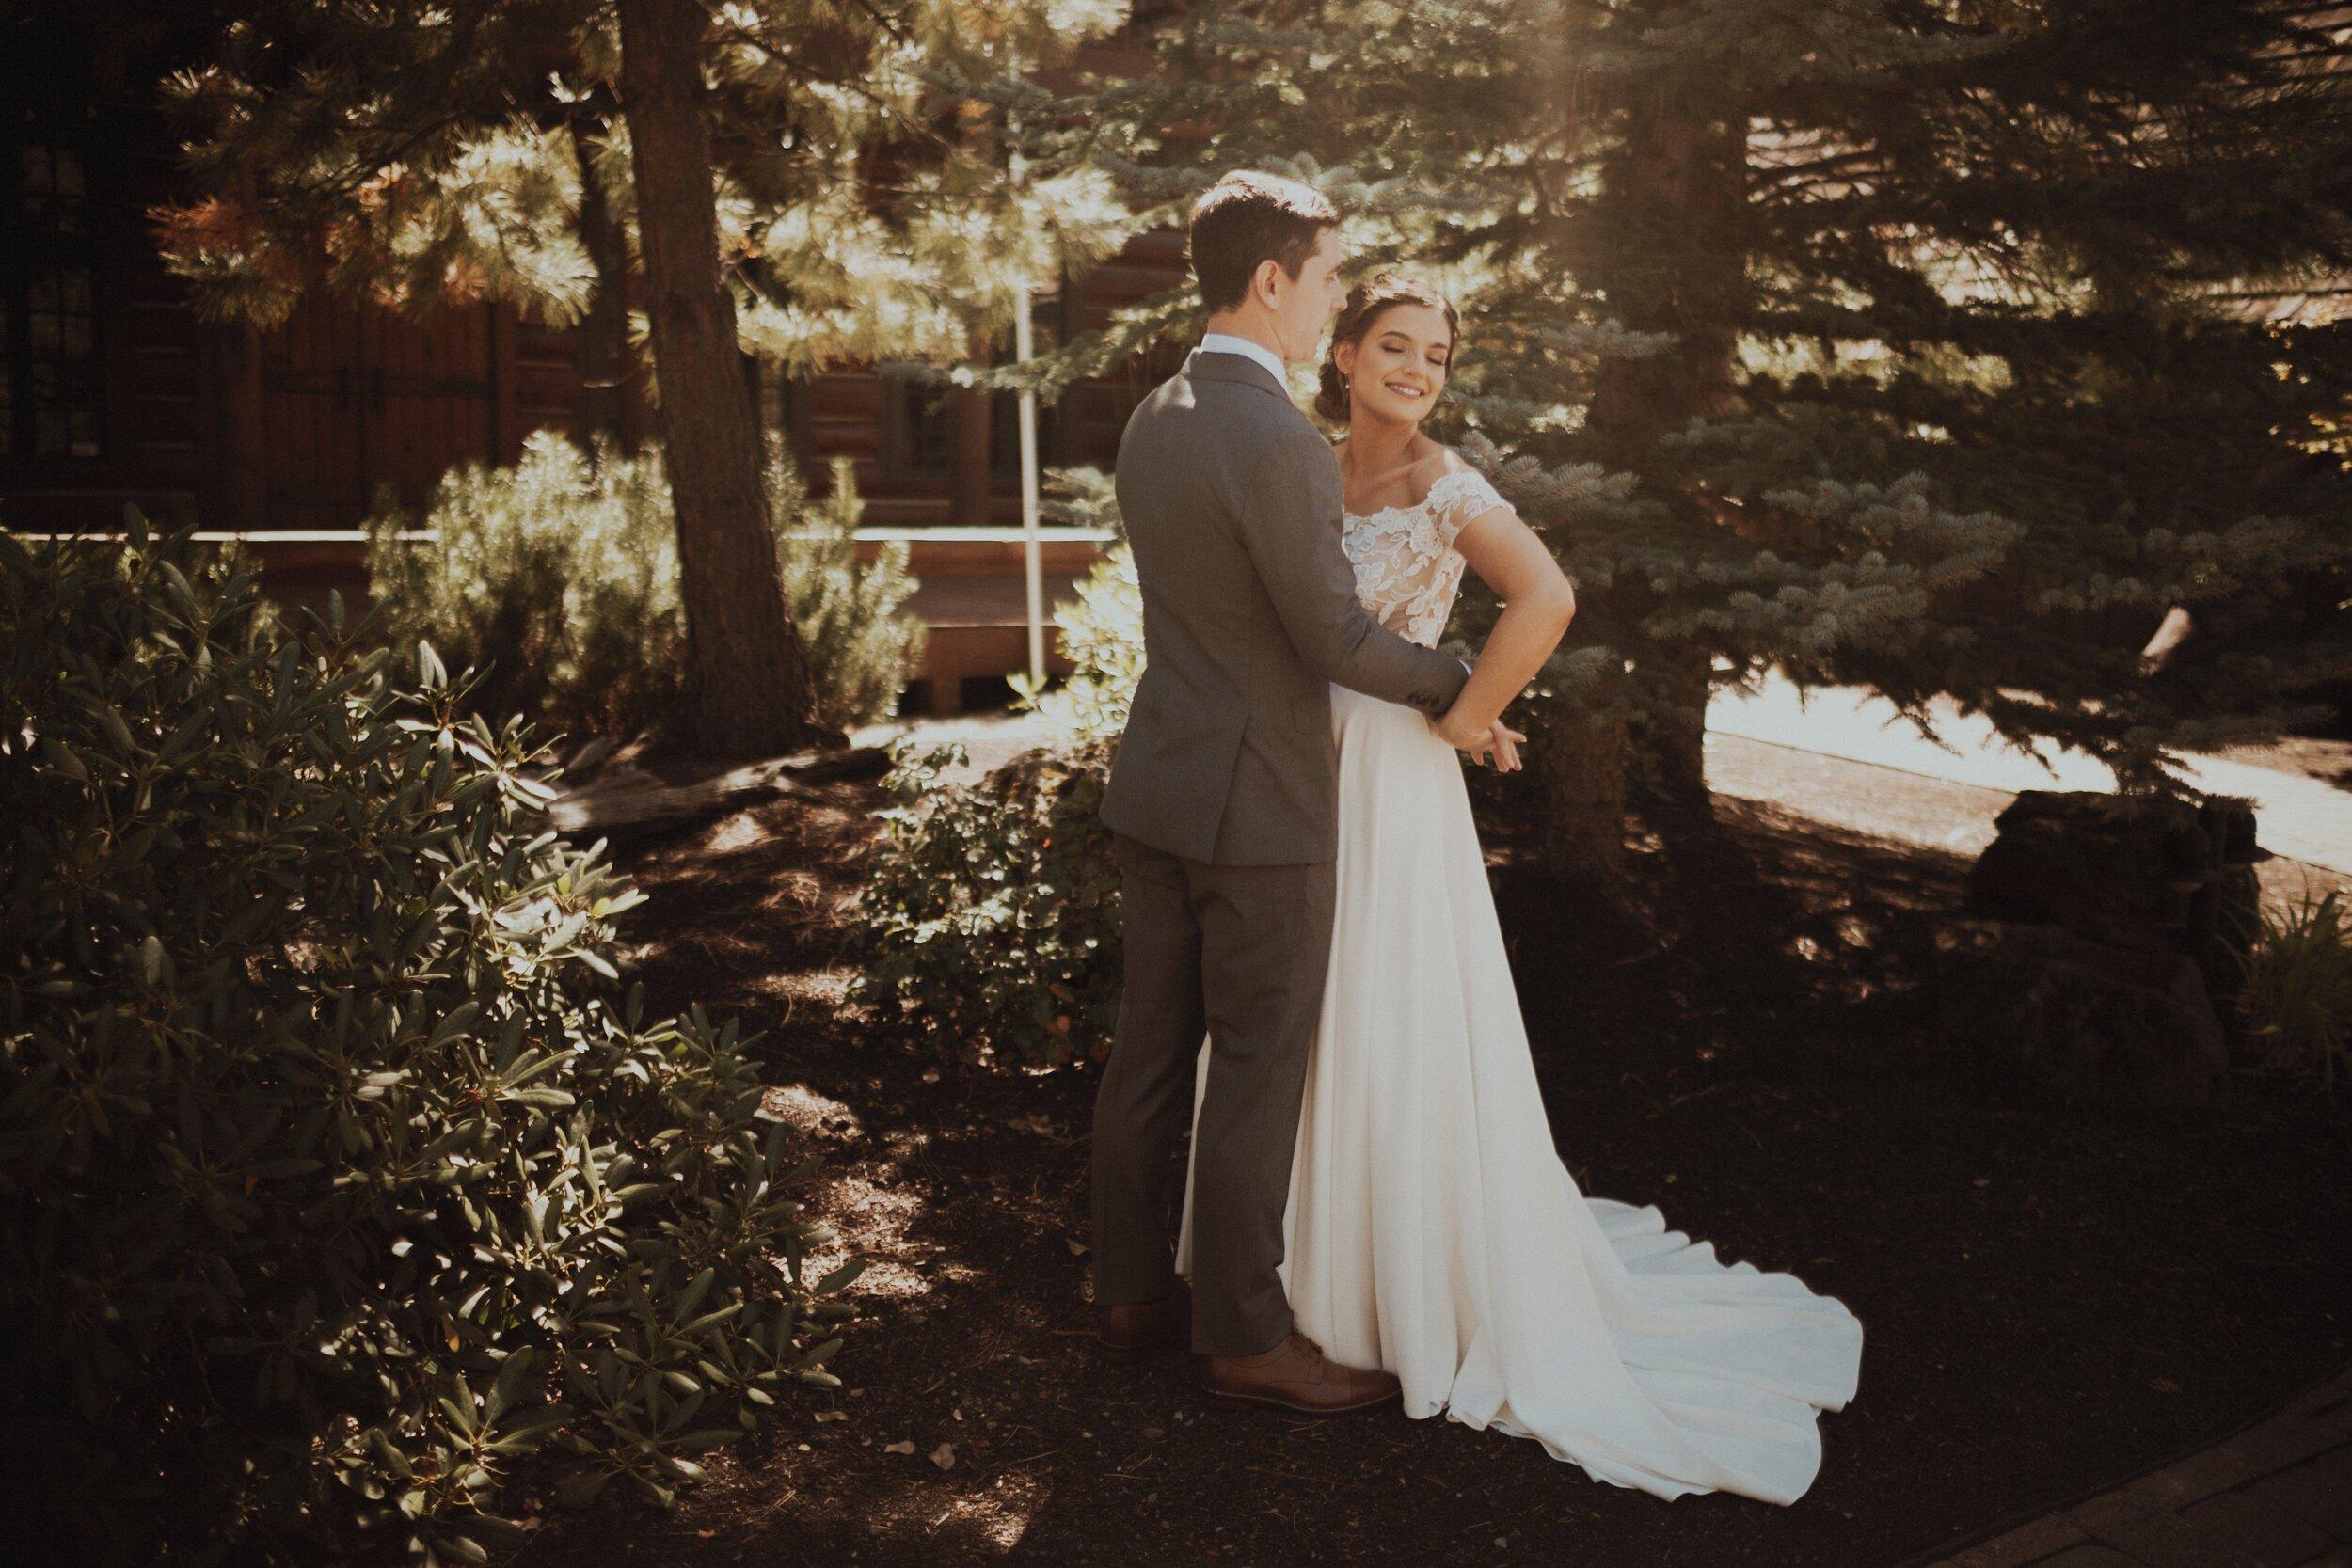 J and M Wed in Sunriver.Lauren Apel Photo234.jpg